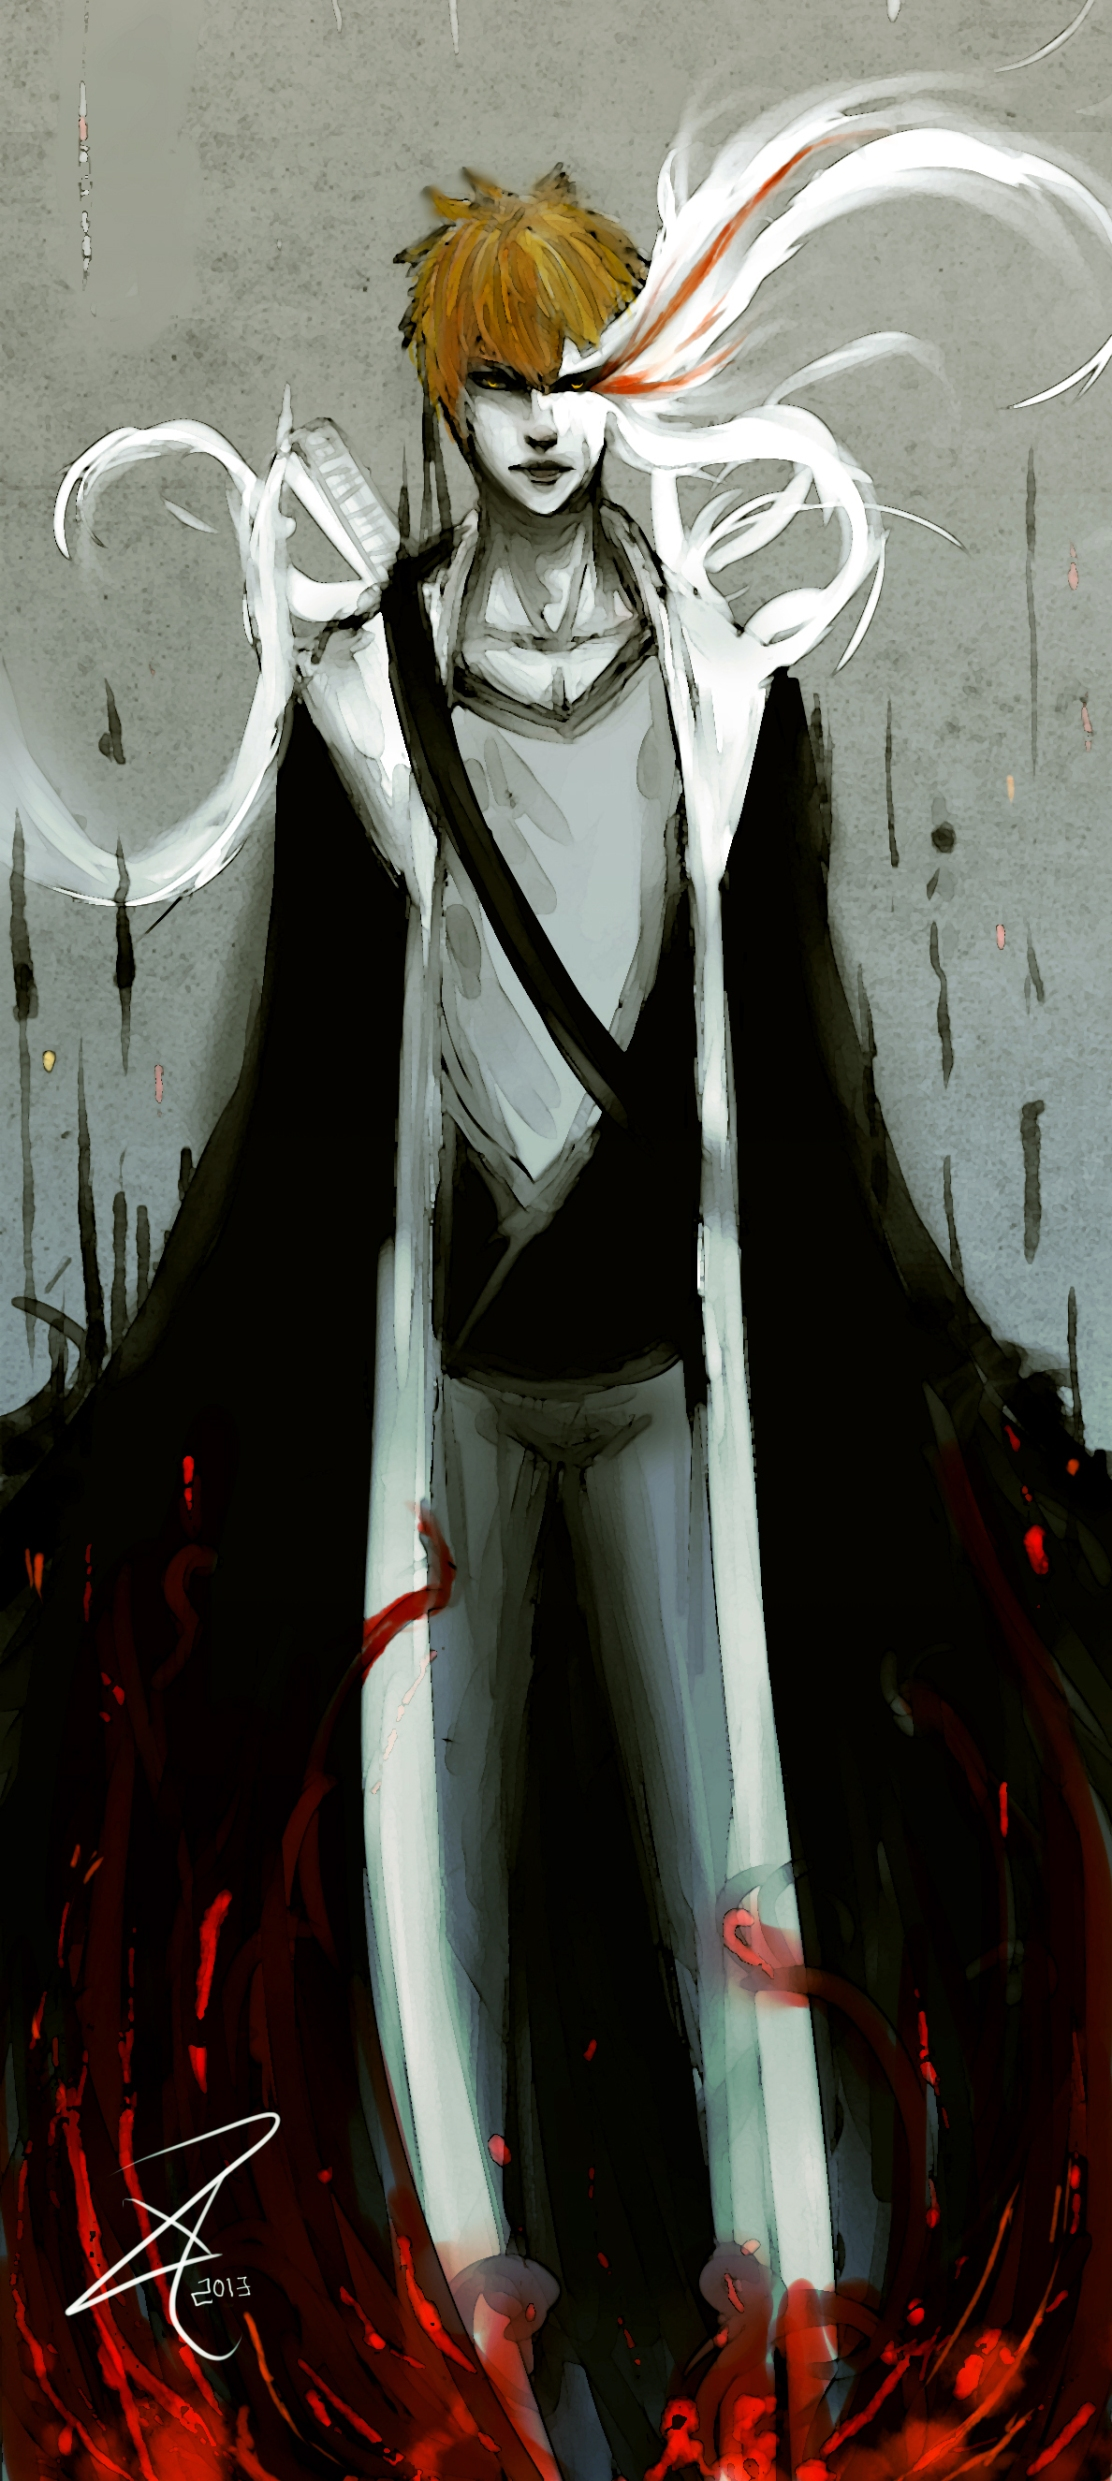 red_white_black_by_vyxinzhe-d6o8cb3